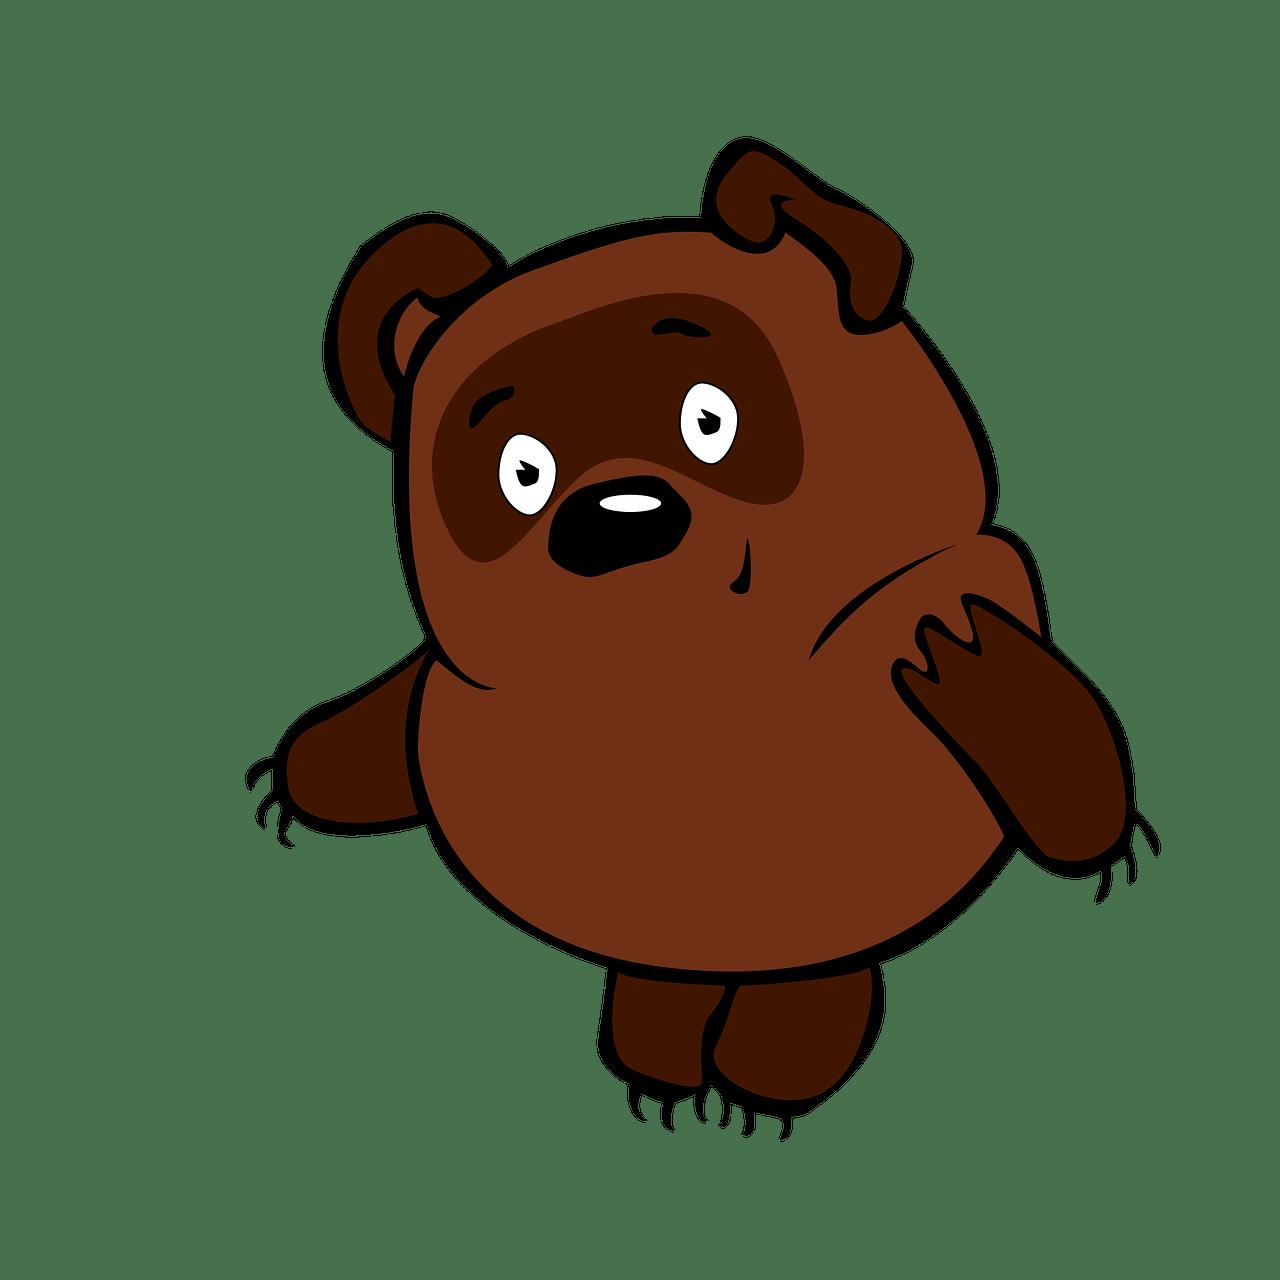 Bear Clipart transparent PNG.